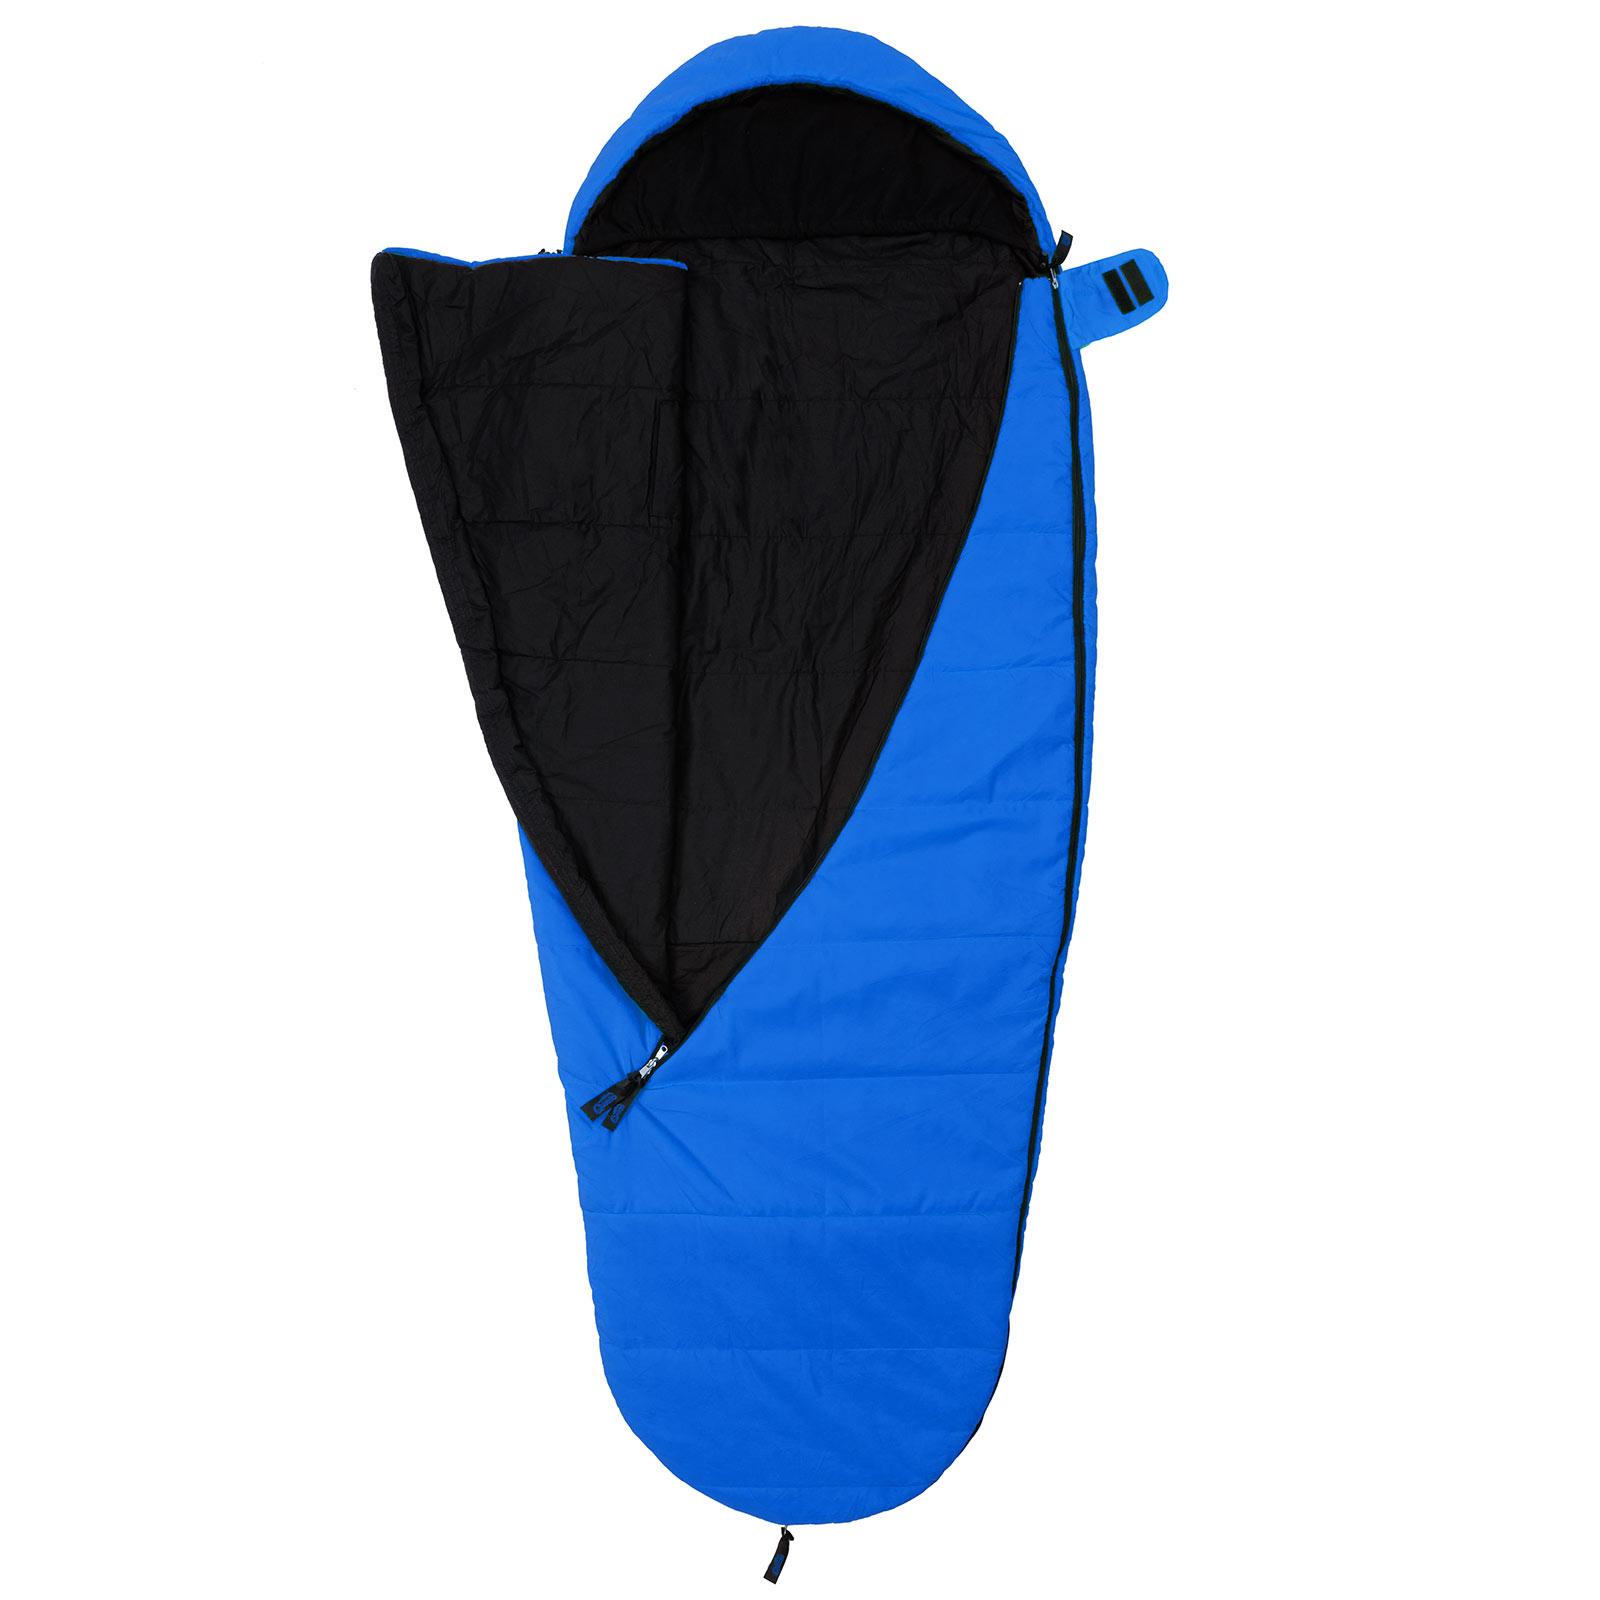 schlafsack camping qeedo buddy mumien schlafsack. Black Bedroom Furniture Sets. Home Design Ideas